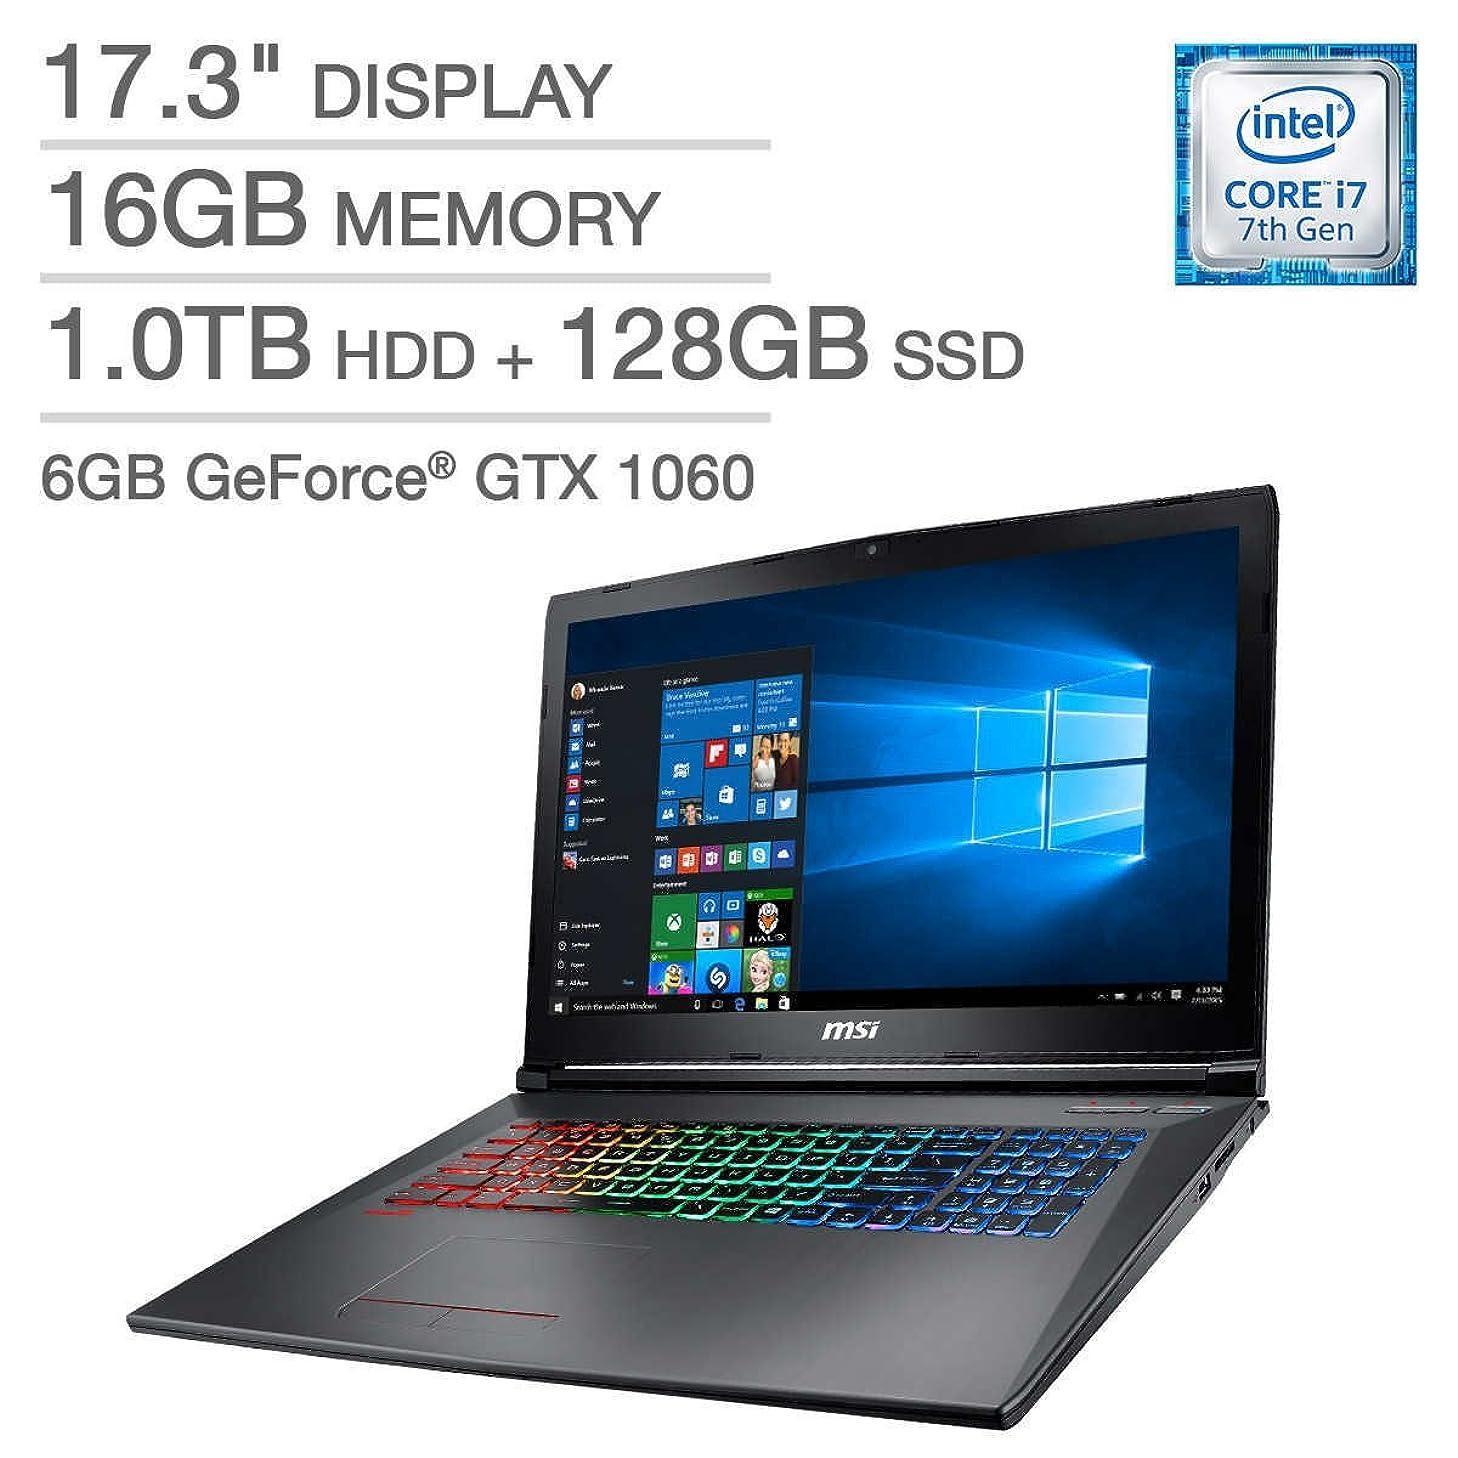 MSI GF72VR651 Gaming Laptop - Intel Core i7 16GB DDR4 1TB 7200RPM SATA Hard Drive + 128GB NVMe Solid State Drive - 6GB NVIDIA 1060 Graphics (Renewed)